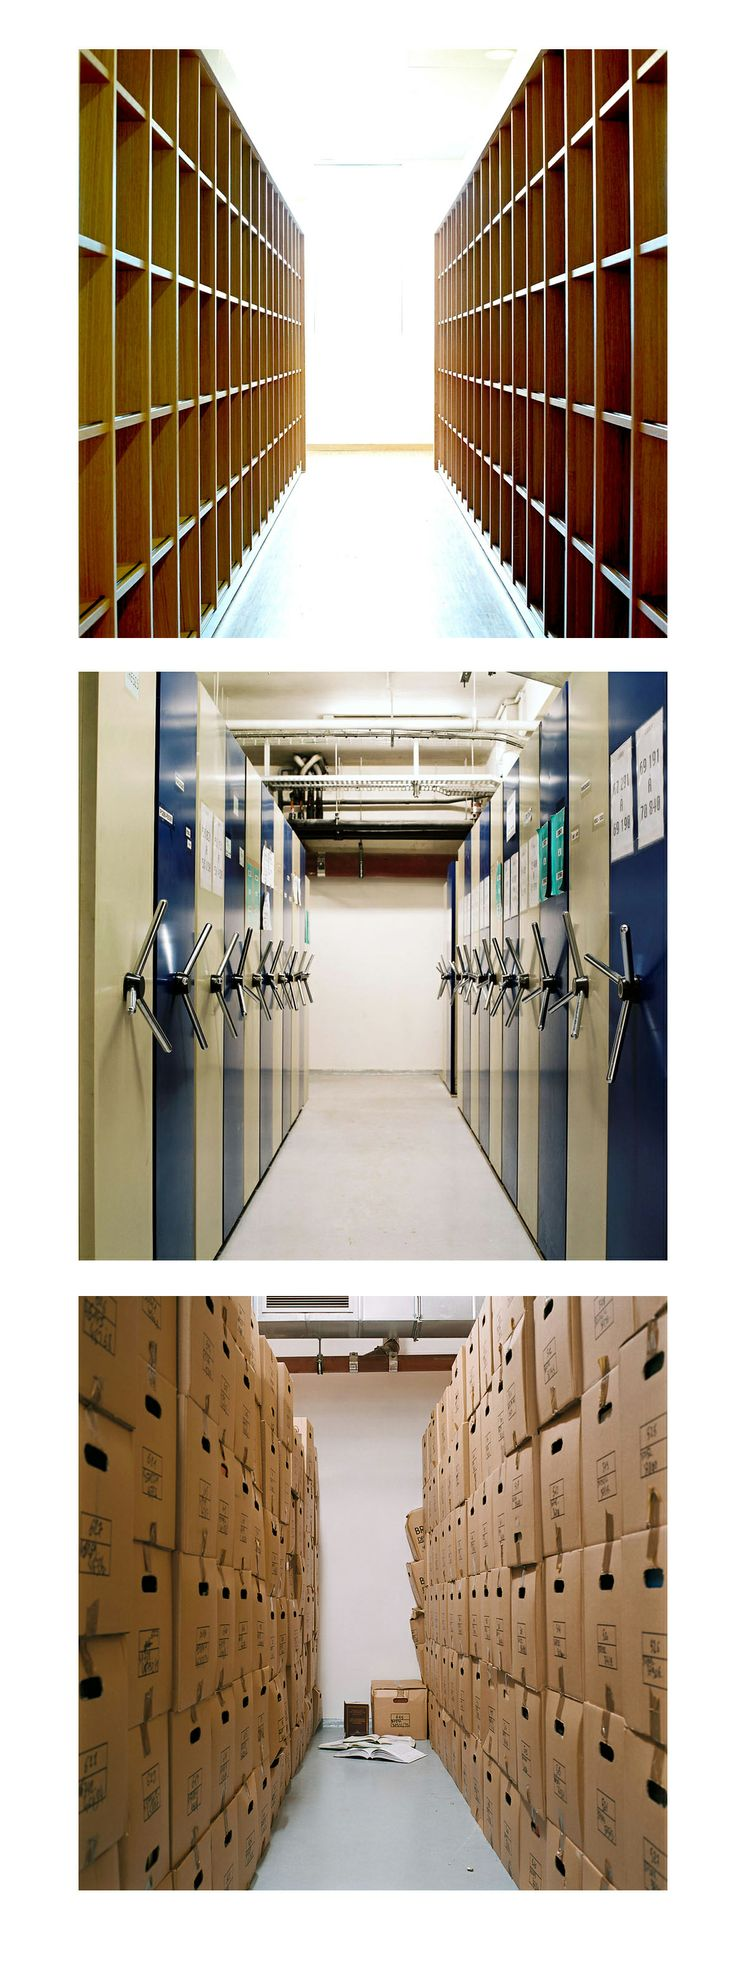 Biblioteca universitaria París 8. 1997-1998. Fotografía analógica 6x6. © Iván Segura Lara Articulo: IVAN SEGURA http://revistas.udistrital.edu.co/ojs/index.php/c14/article/view/3967